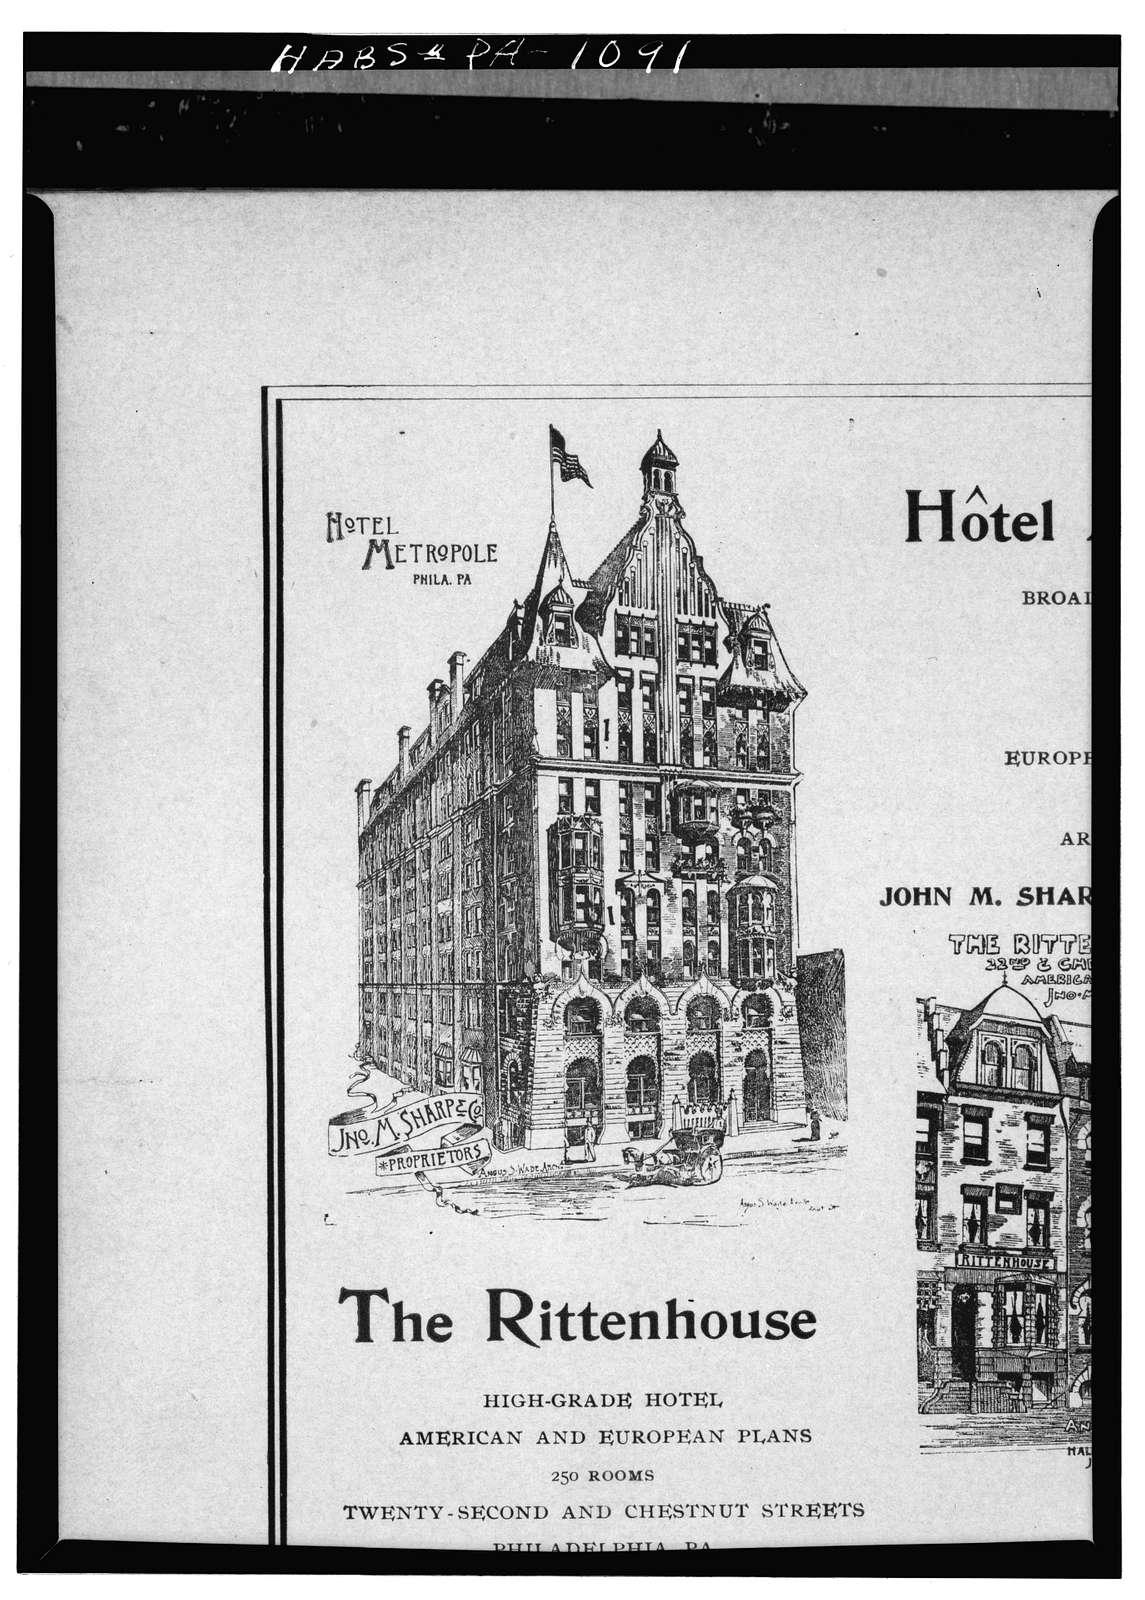 Hotel Walton, Broad & Locust Streets, Philadelphia, Philadelphia County, PA